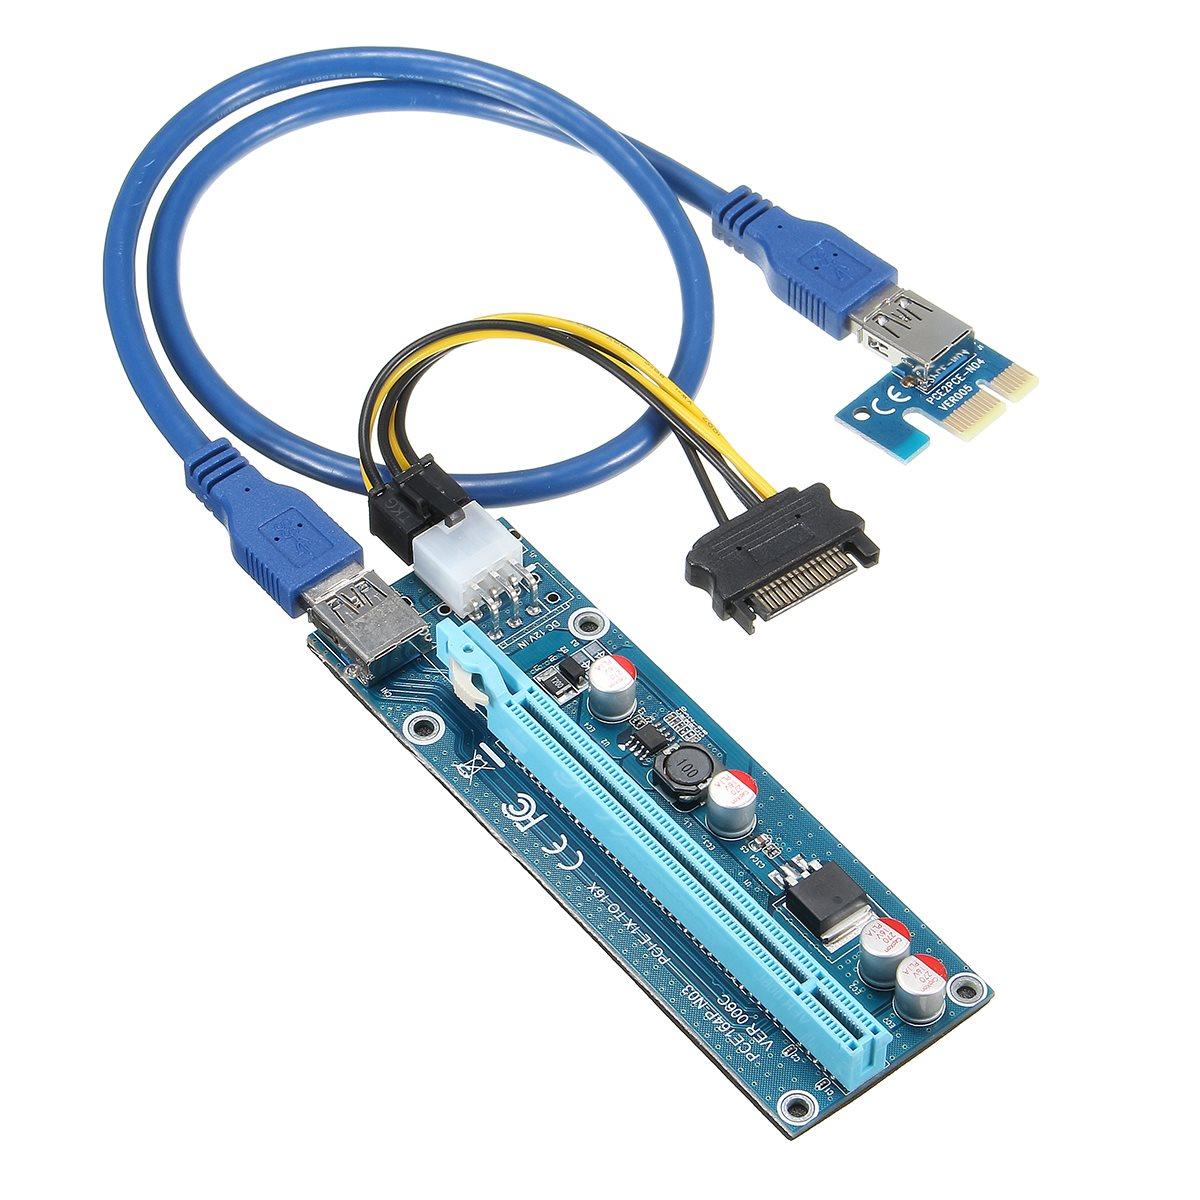 Wholesale 6pcs USB 3.0 PCI-E Express 1X 4x 8x 16x Extender Riser Adapter Card SATA 15pin Male to 6pin Power Cable(China (Mainland))